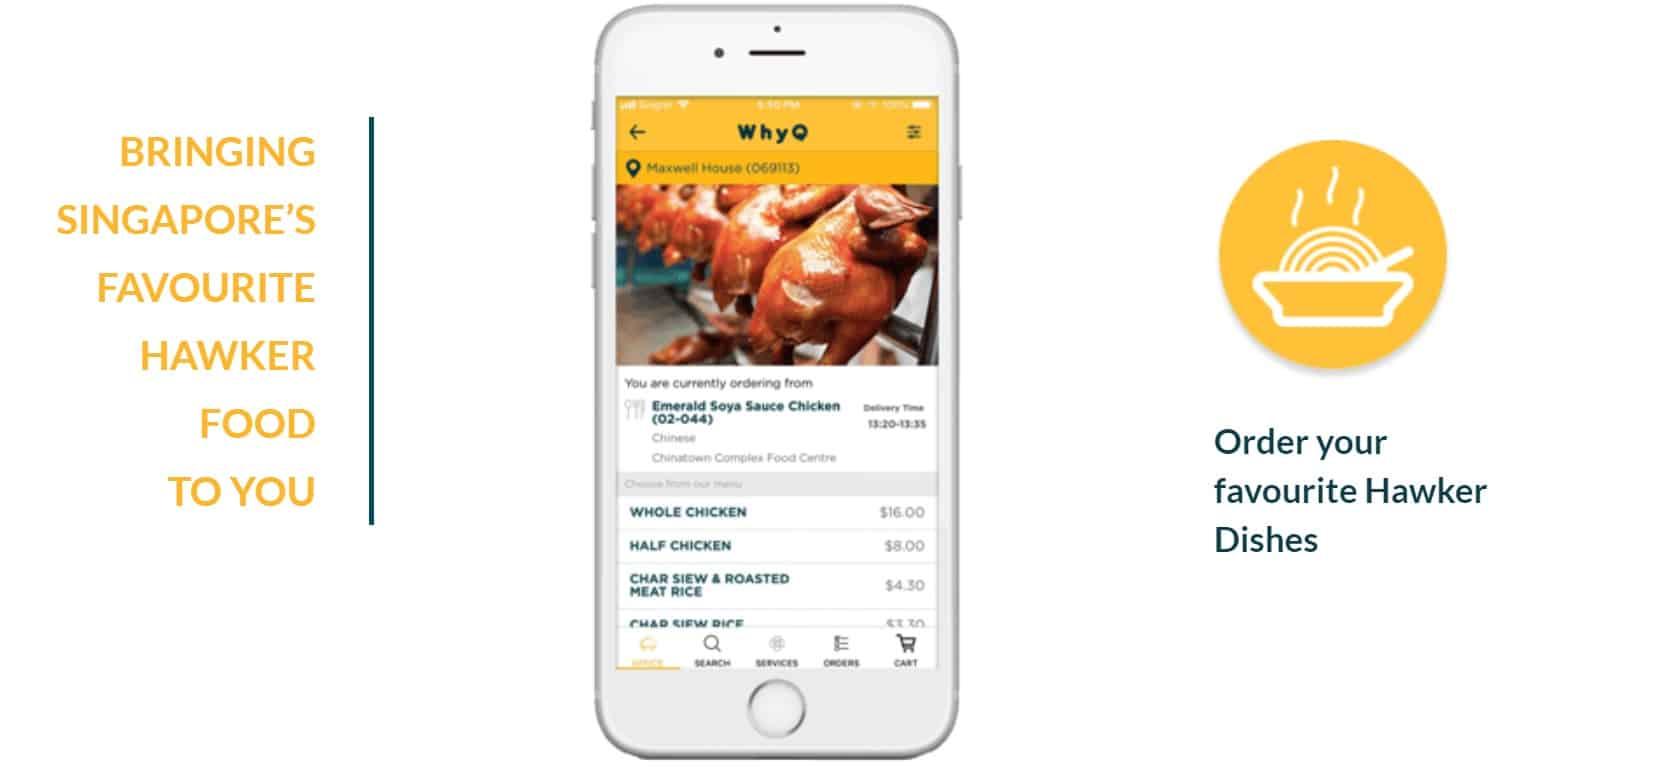 WhyQ Hawker Food Promo Code